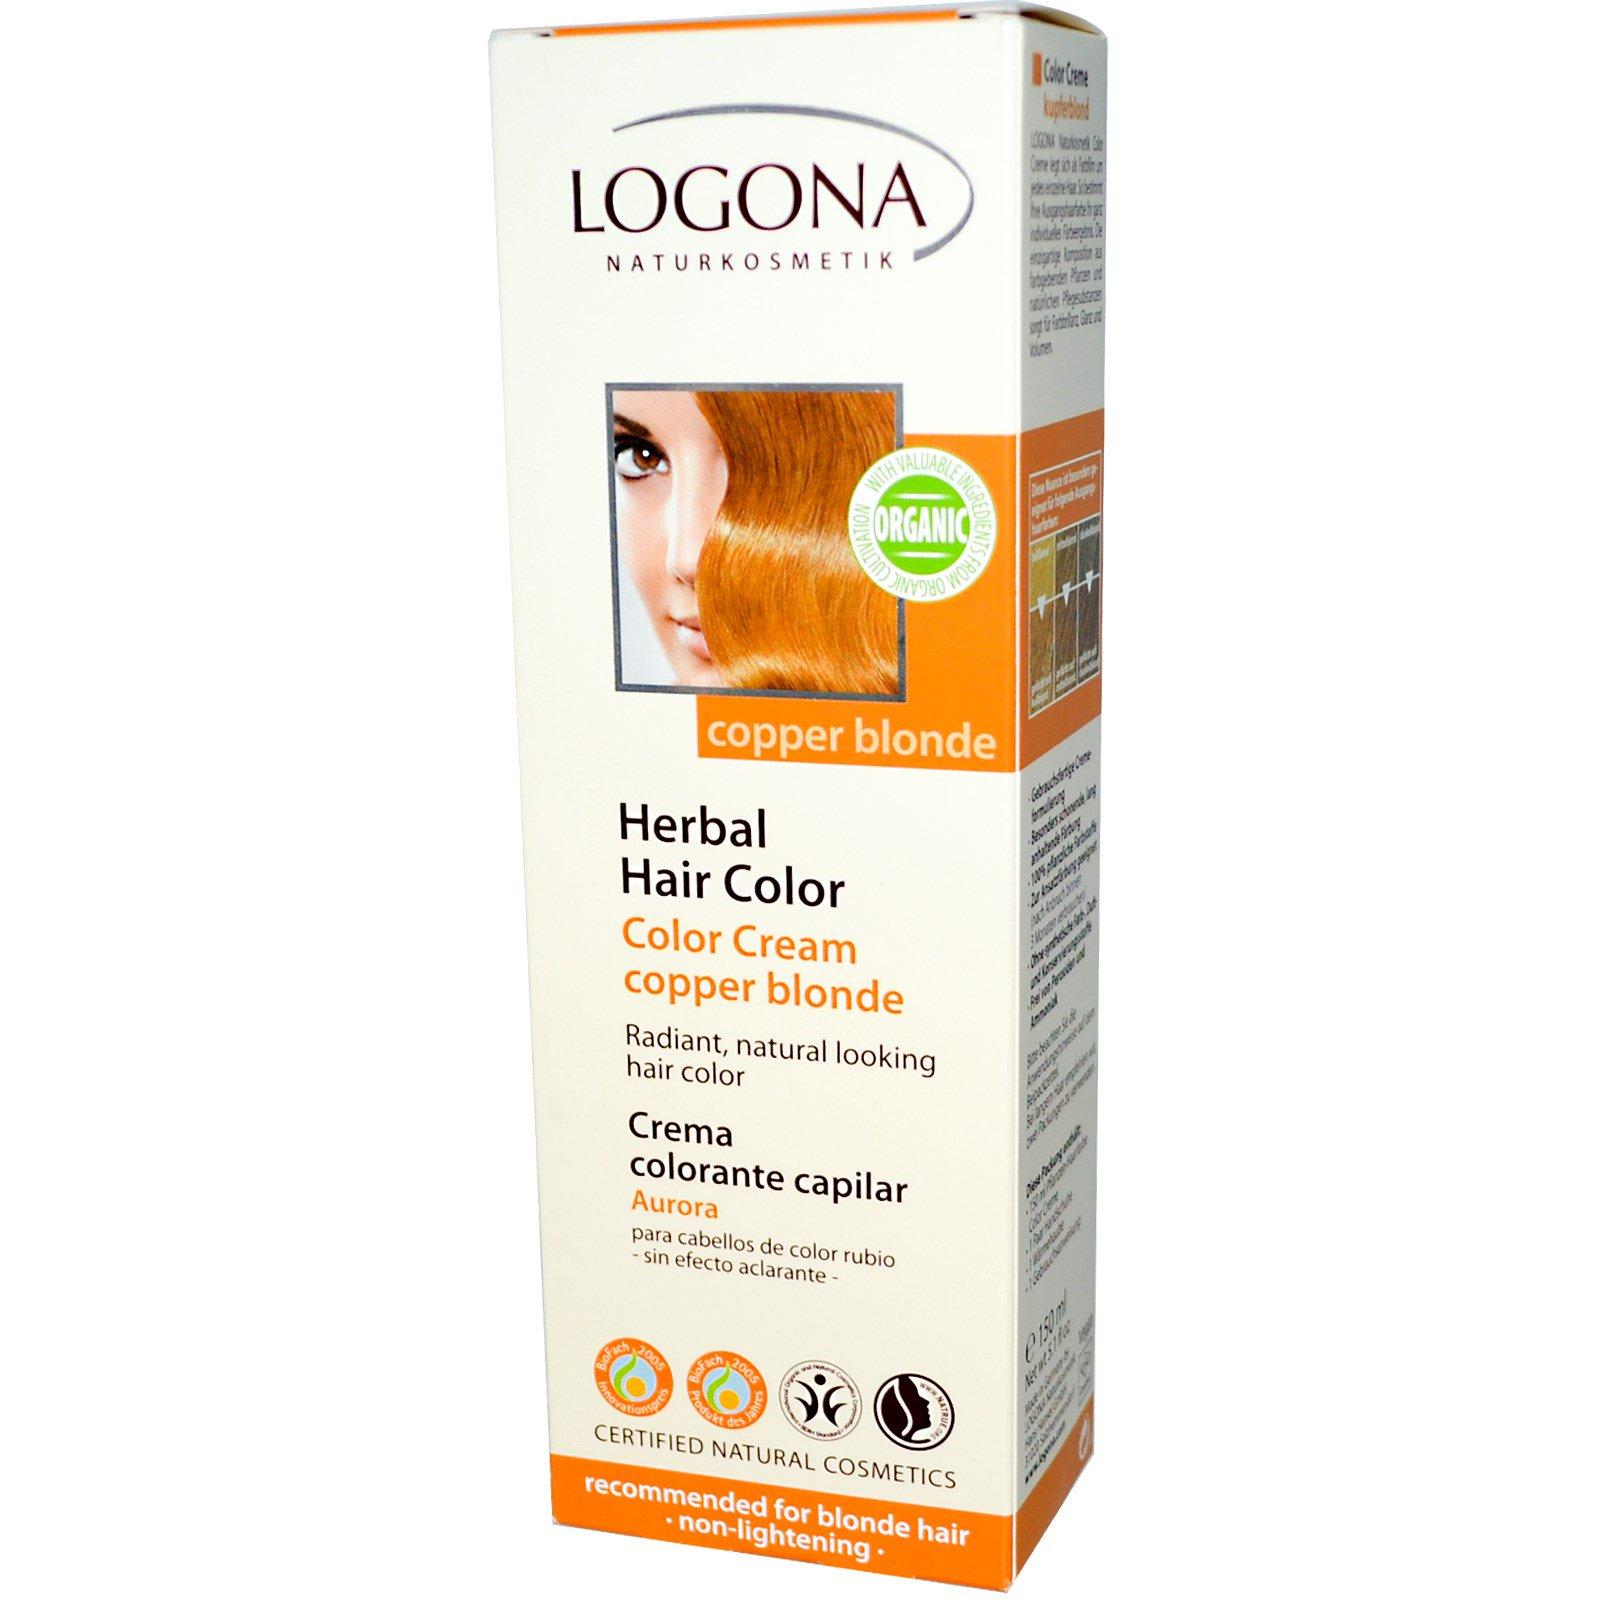 Logona Naturkosmetik Herbal Hair Color Copper Blonde 51 Fl Oz